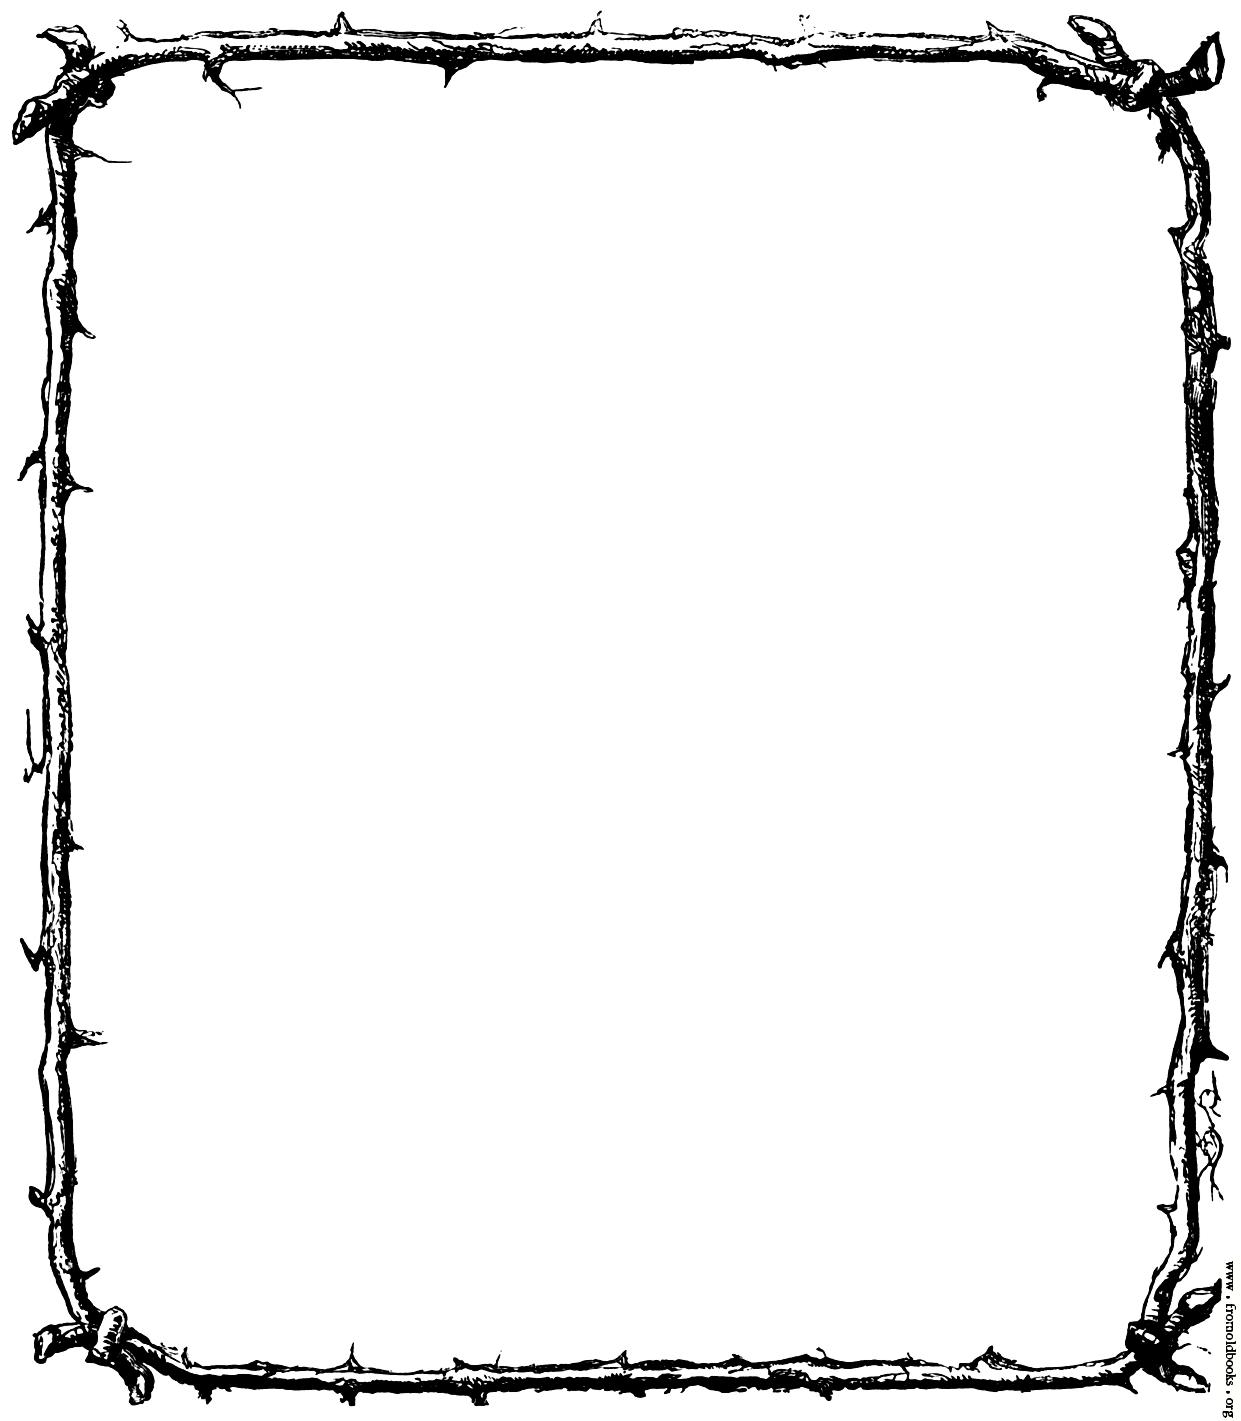 1241x1421 Western Border Clip Art Inderecami Drawing